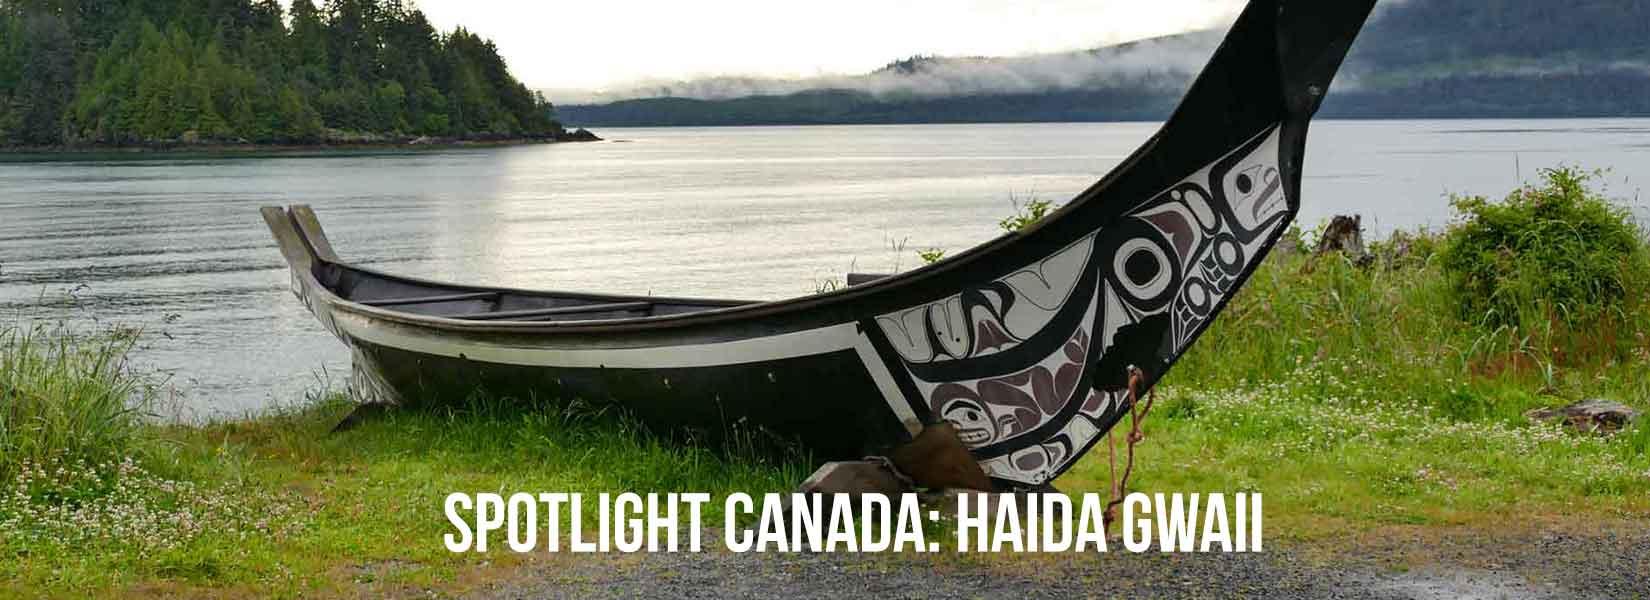 Spotlight Canada haida gwaii